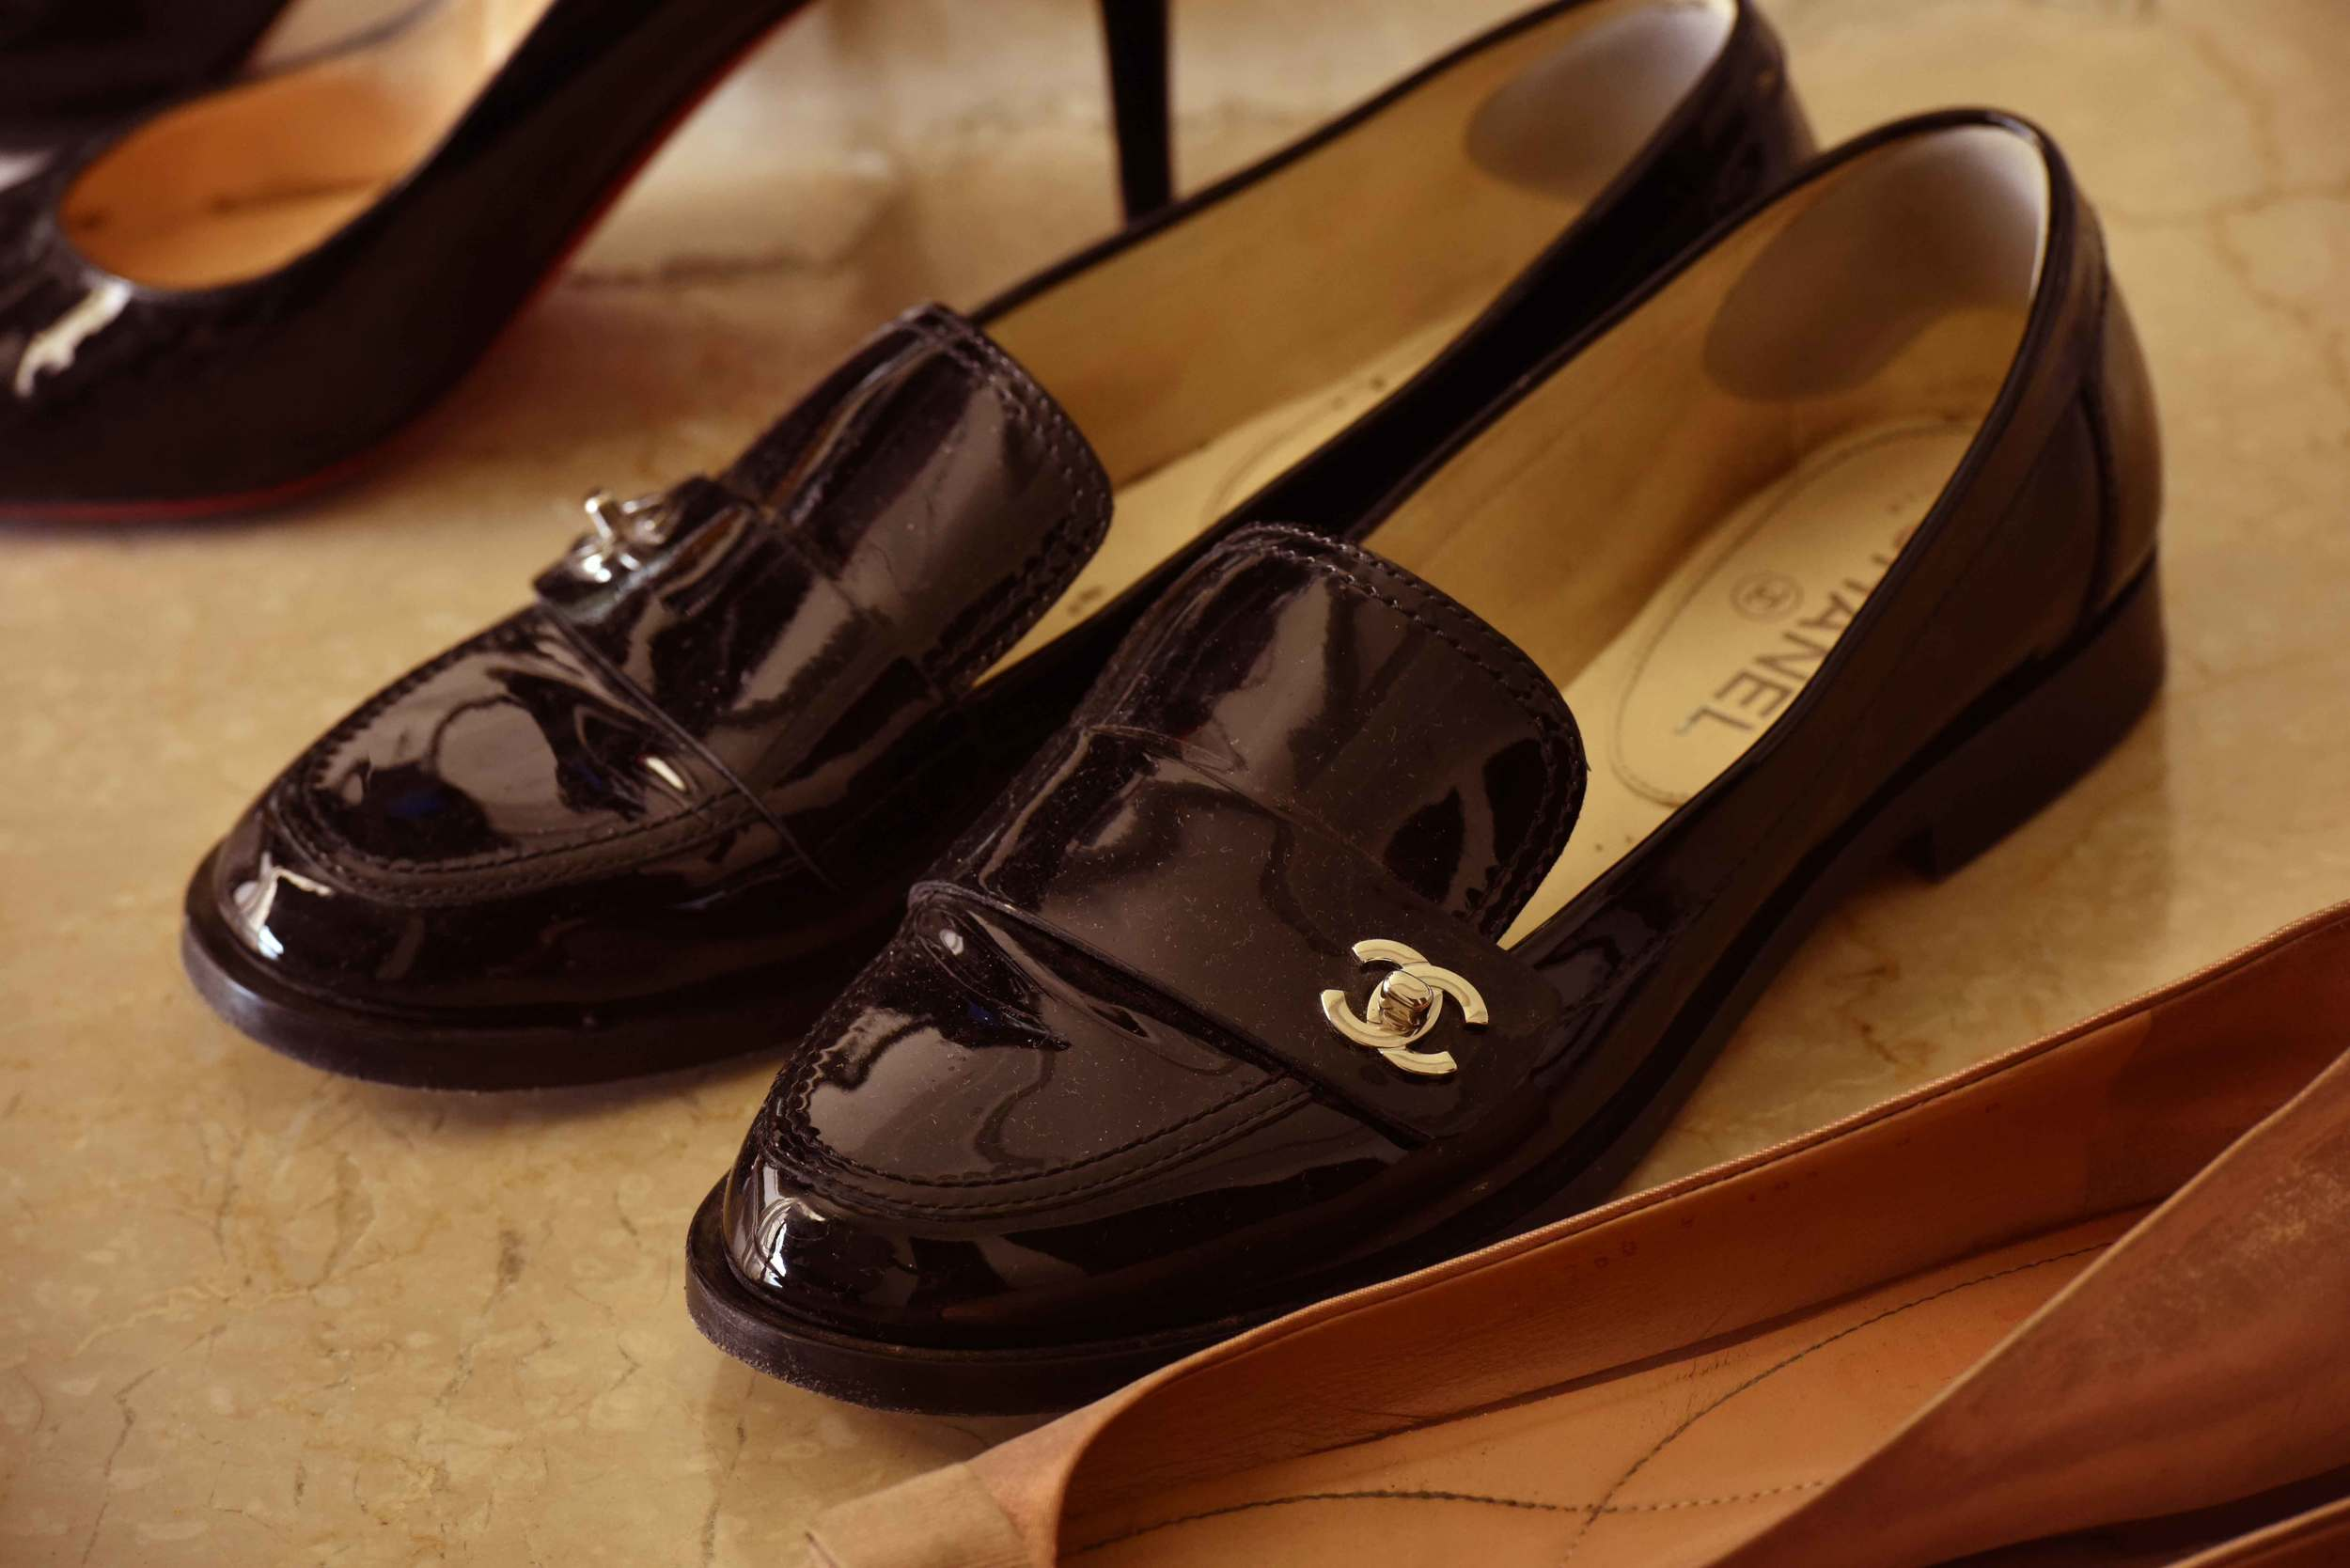 Ferragamo ballet flats, Chanel loafers and Loubitons. Image©gunjanvirk